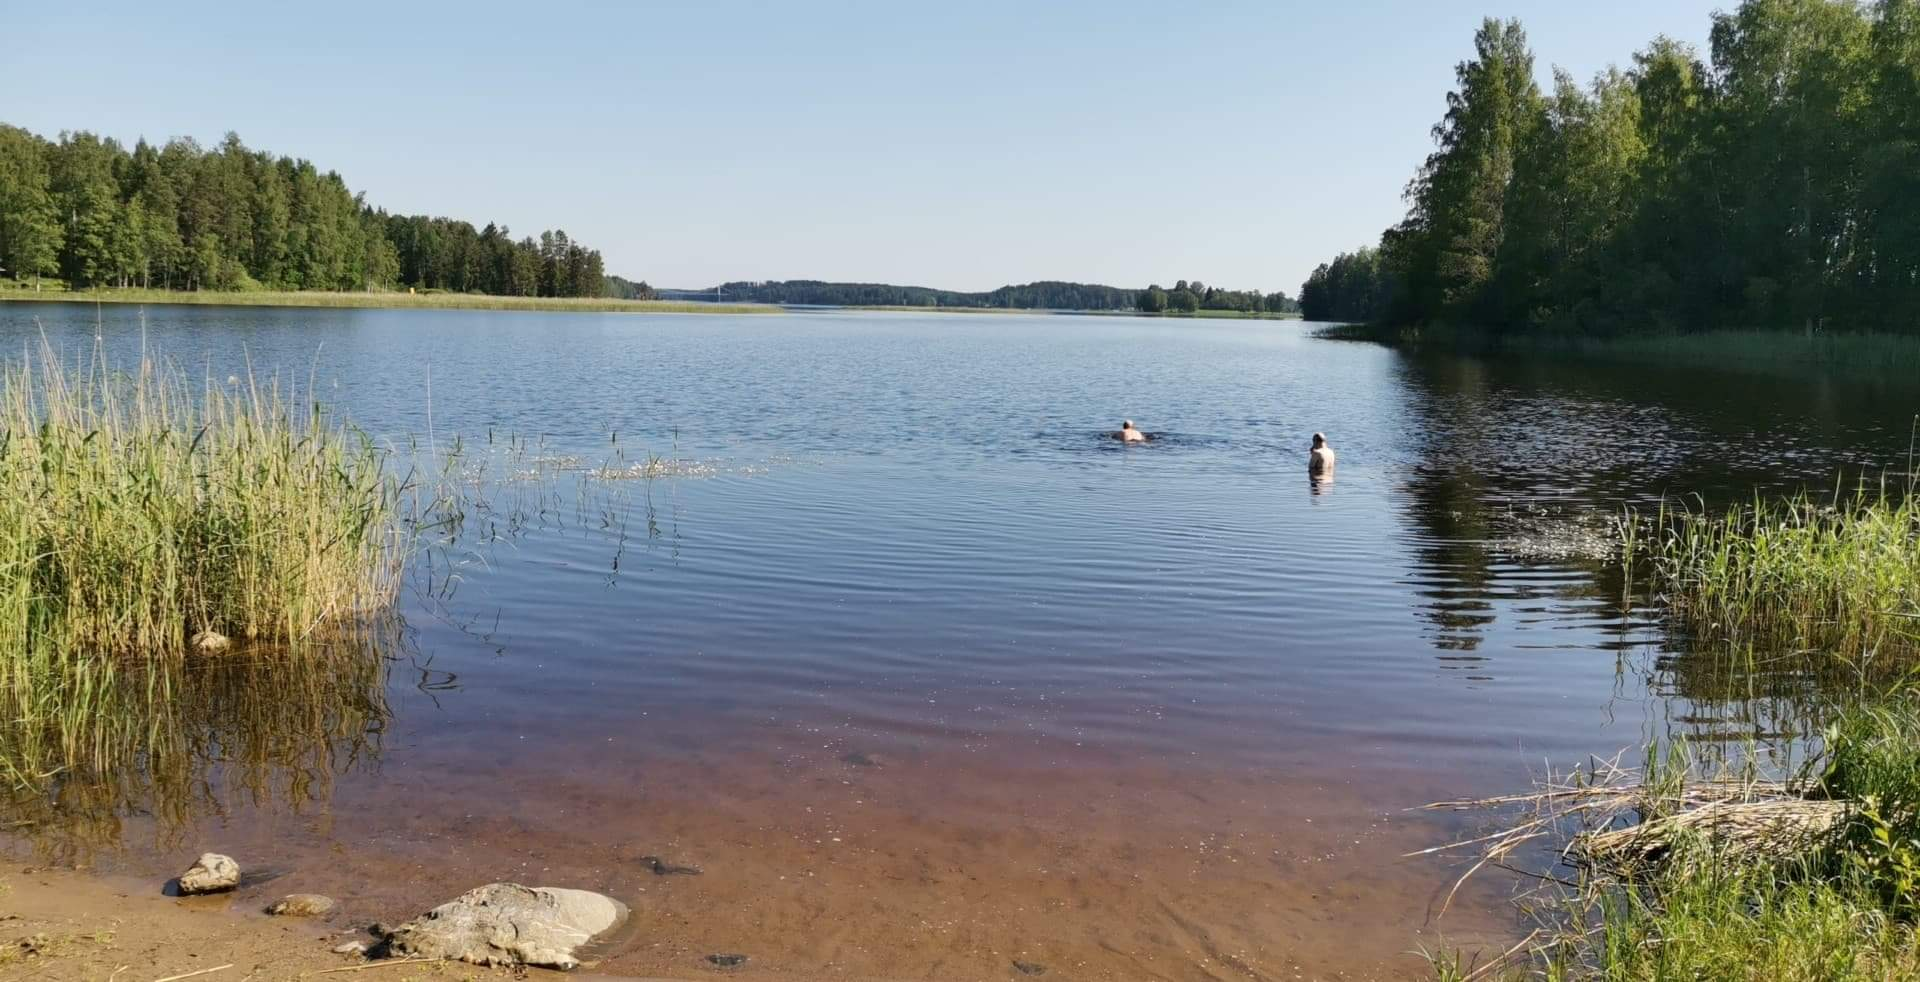 Majakka Kemijärvi